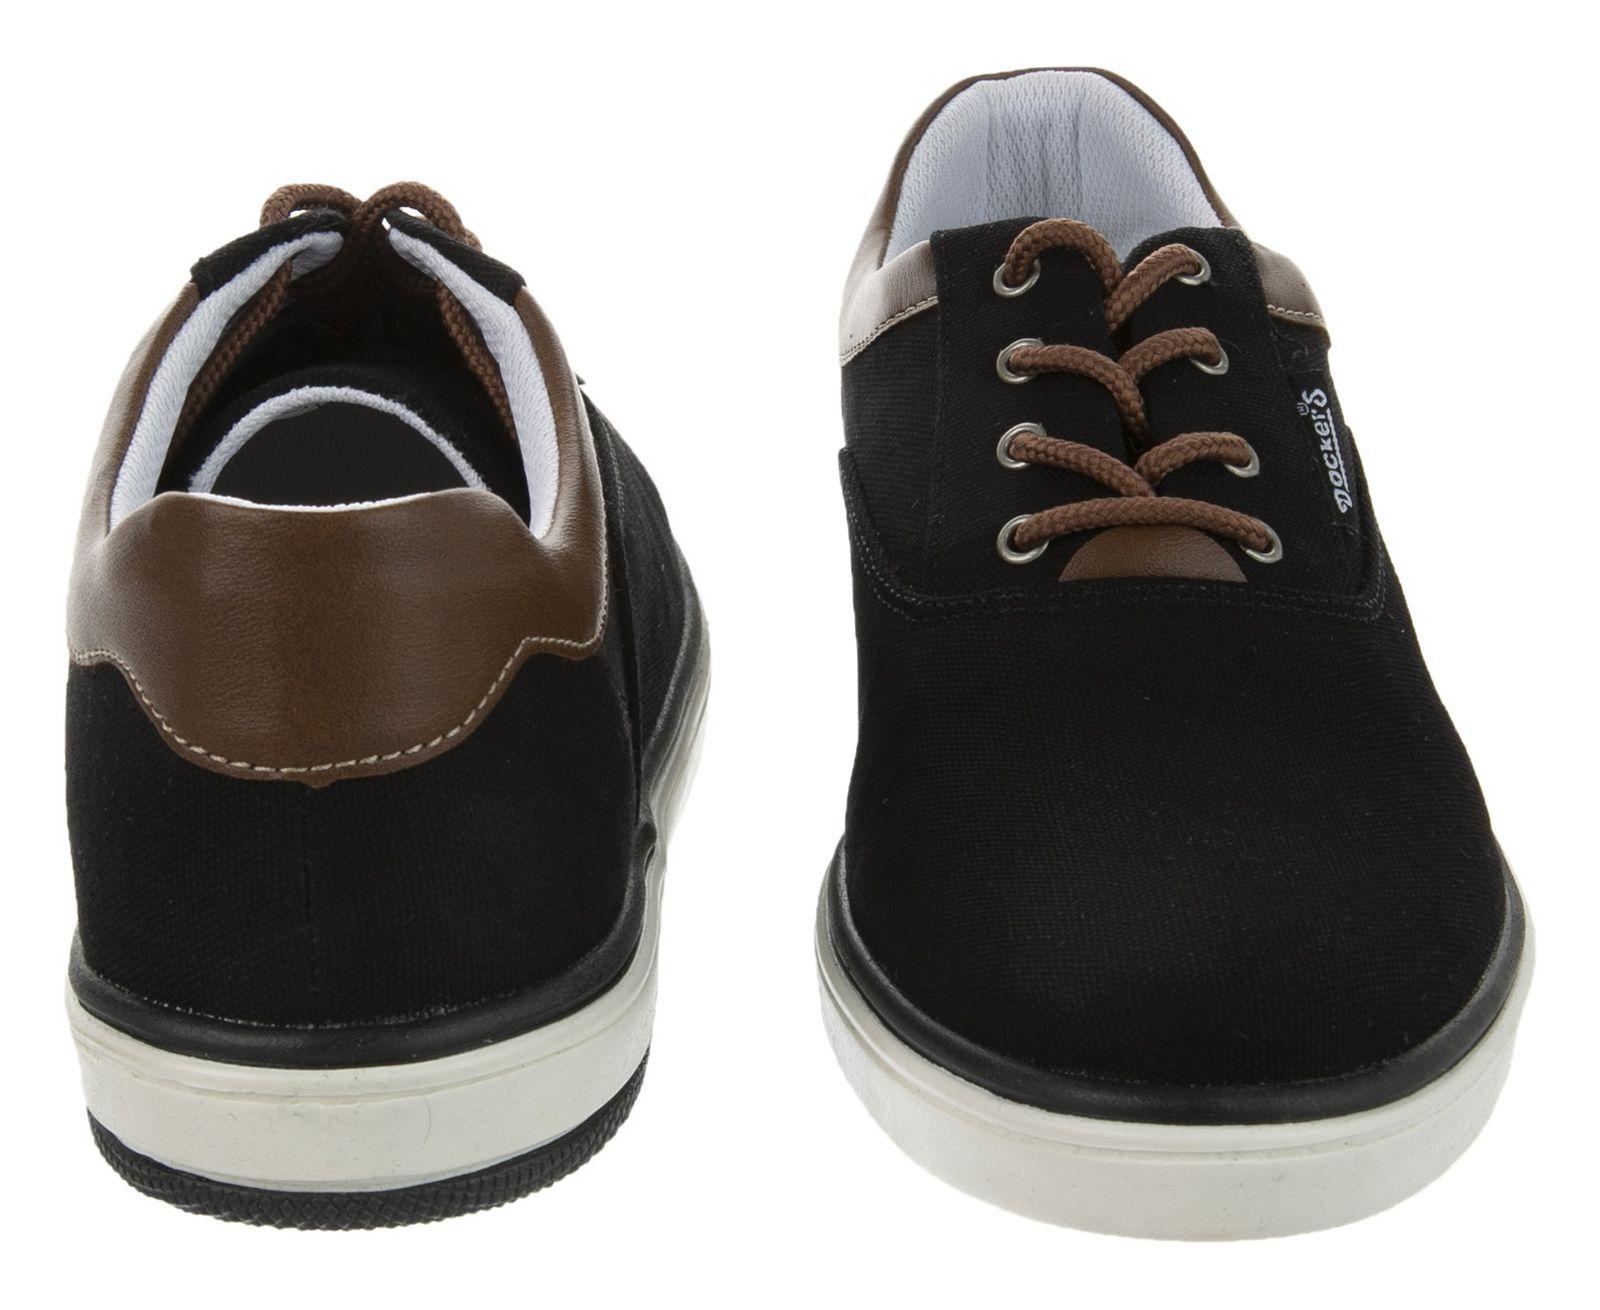 کفش روزمره مردانه داکرز مدل 100234016-BL -  - 4